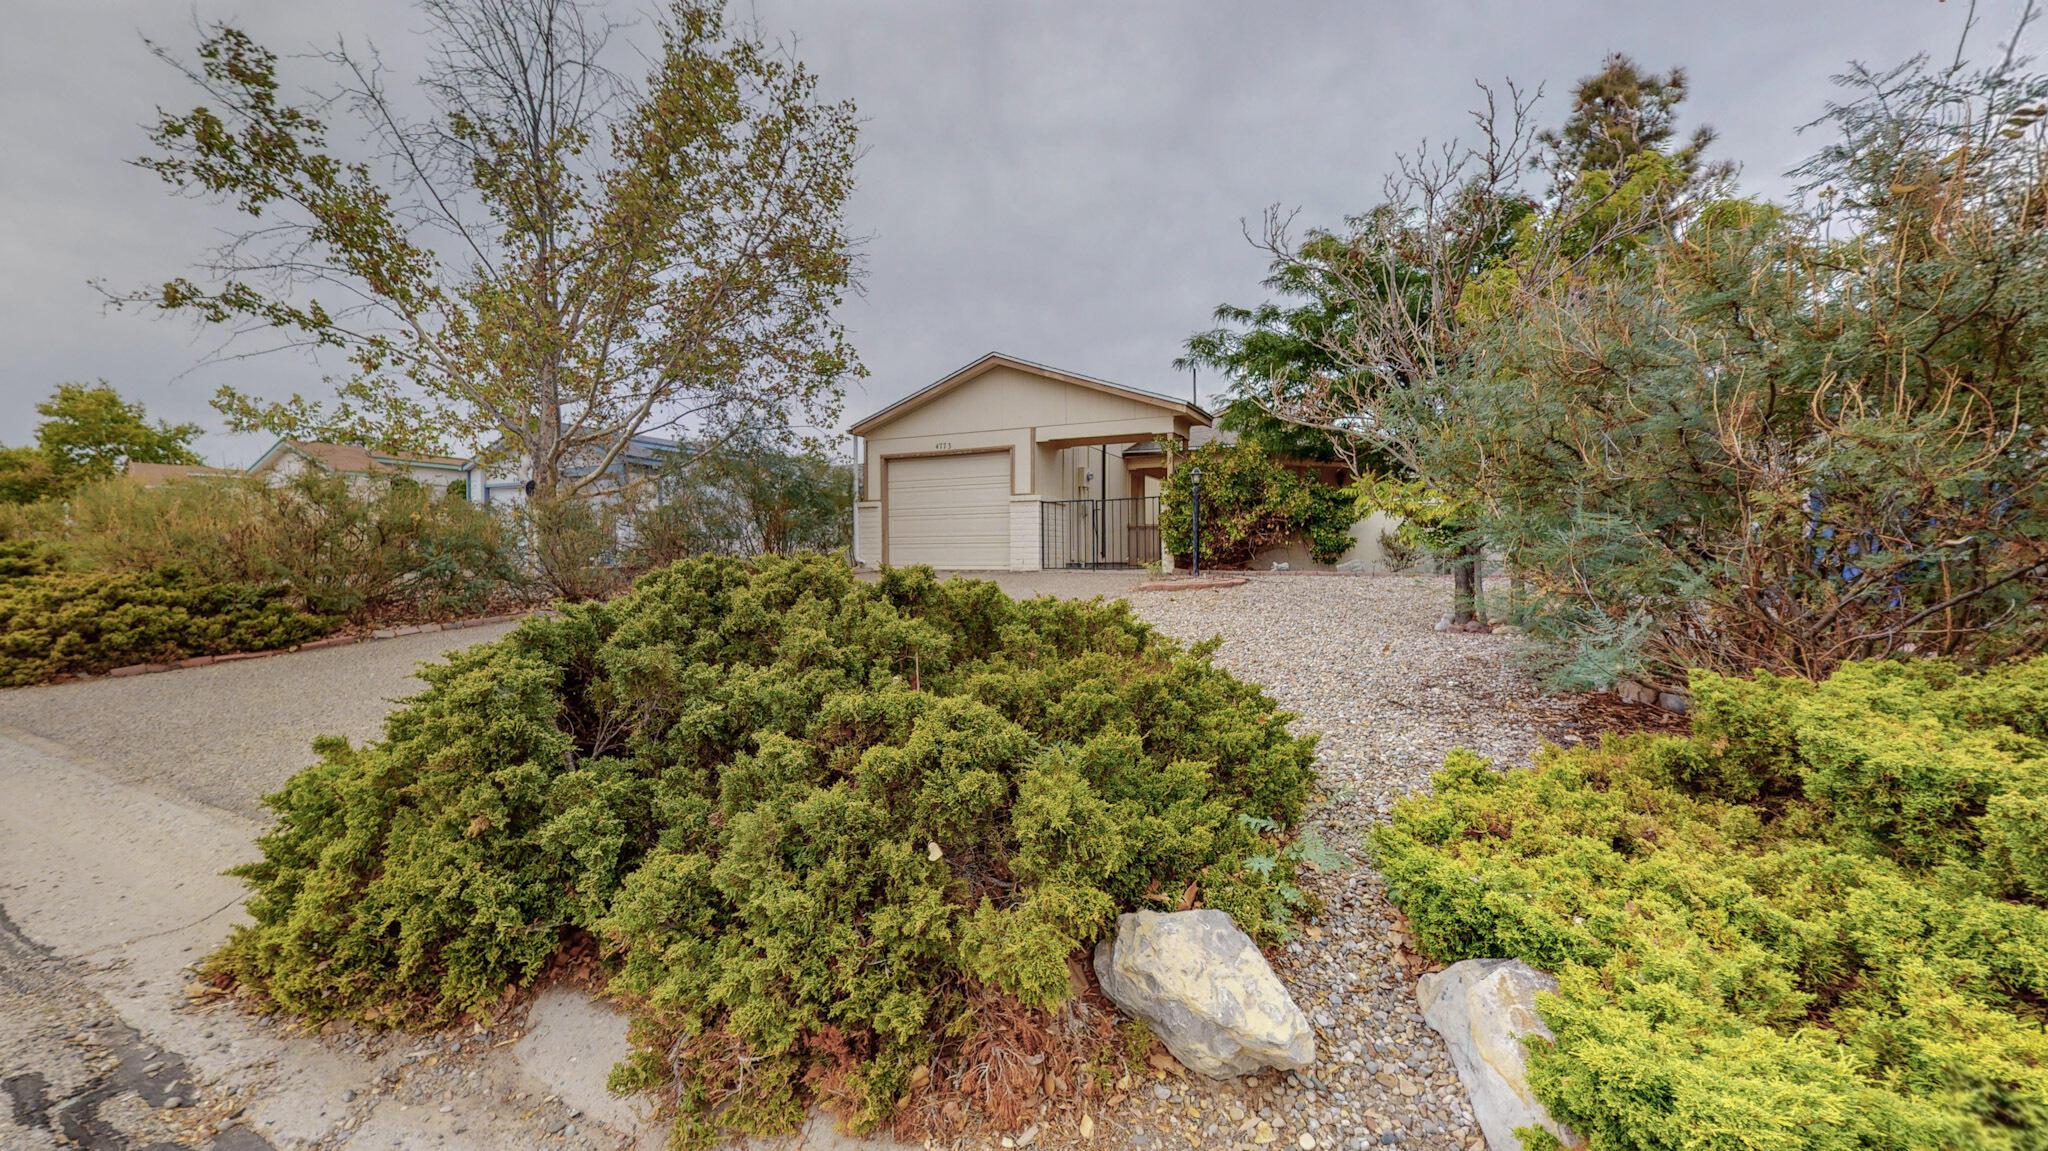 4773 PLATINUM Drive, Rio Rancho NM 87124